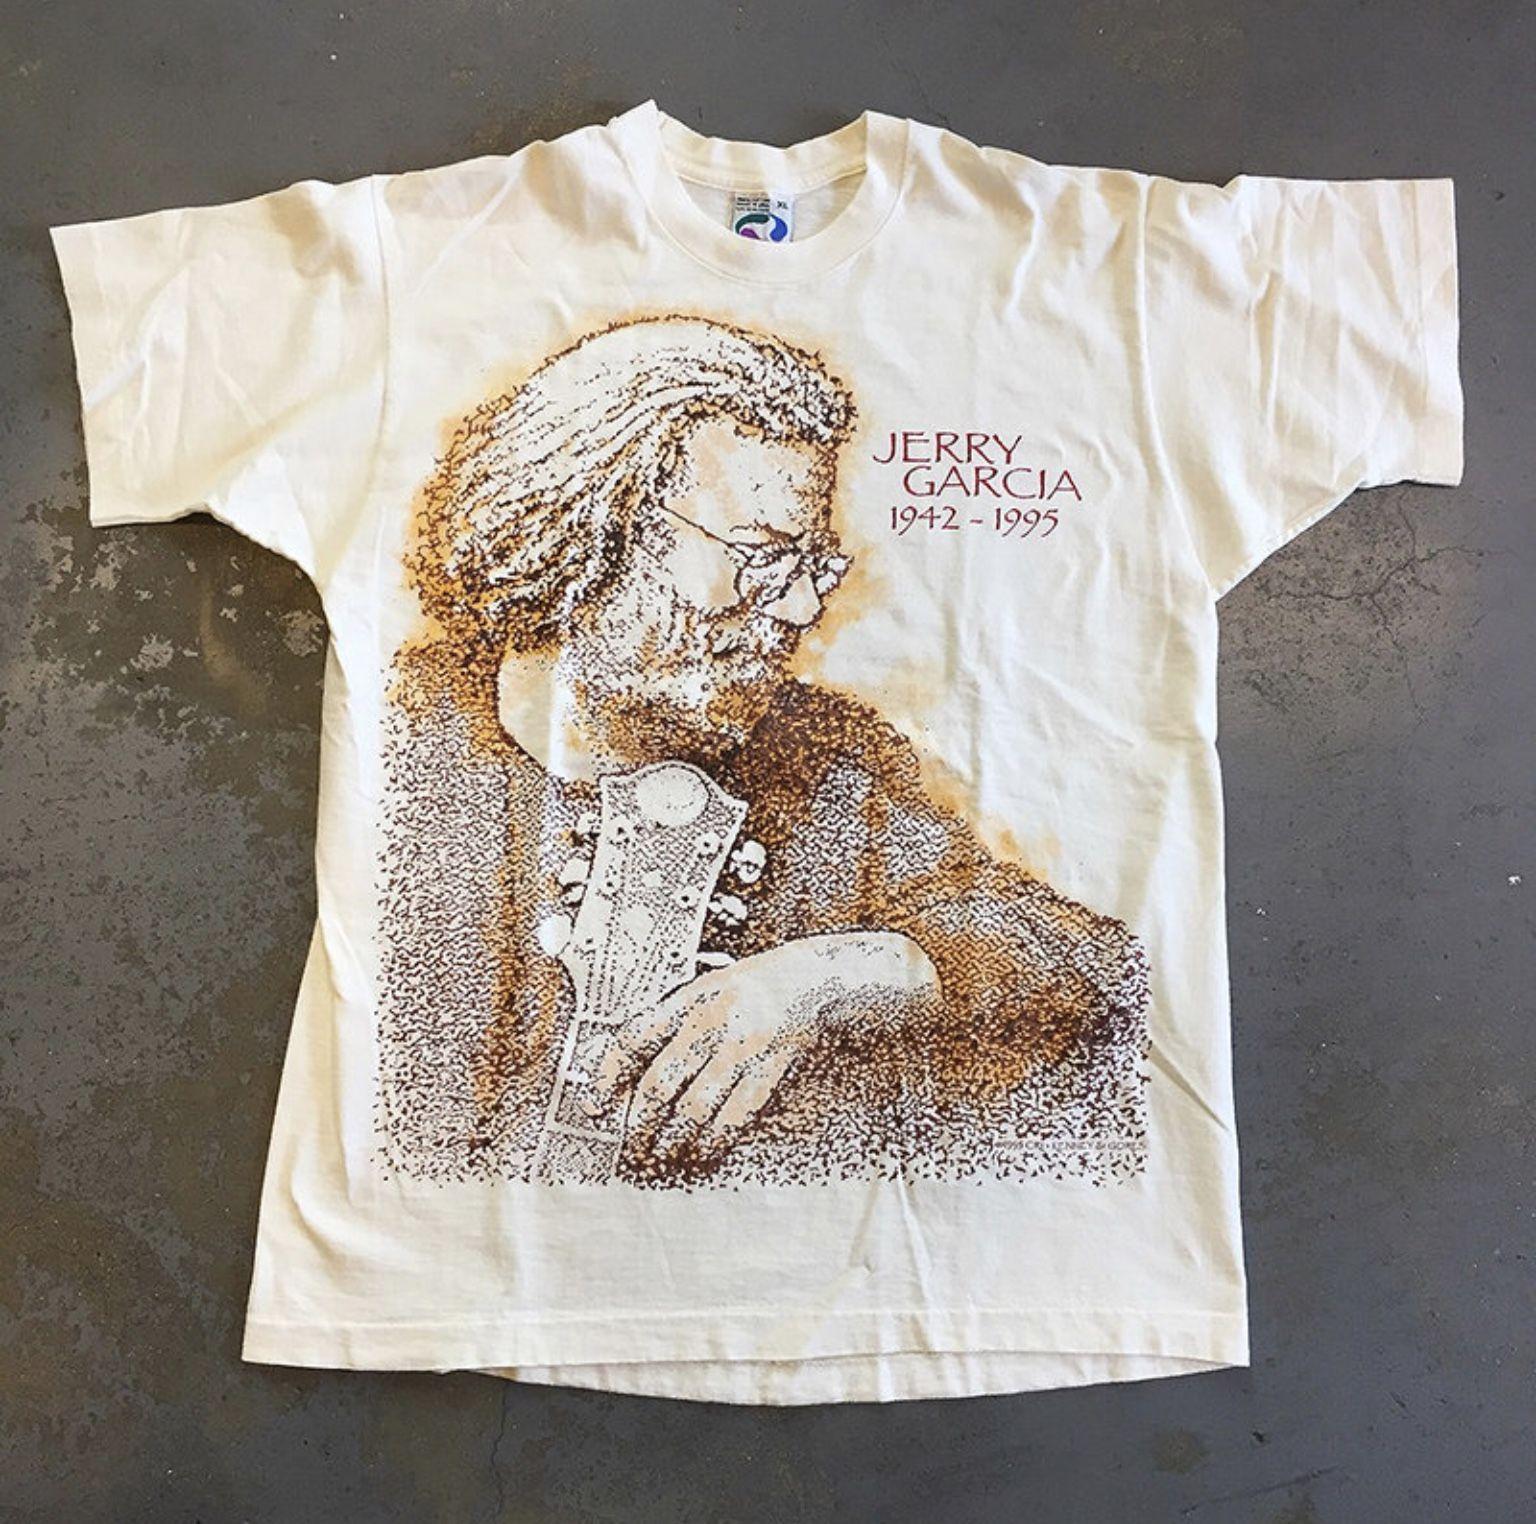 XL Jerry Garcia 1995 rare original vintage tshirt